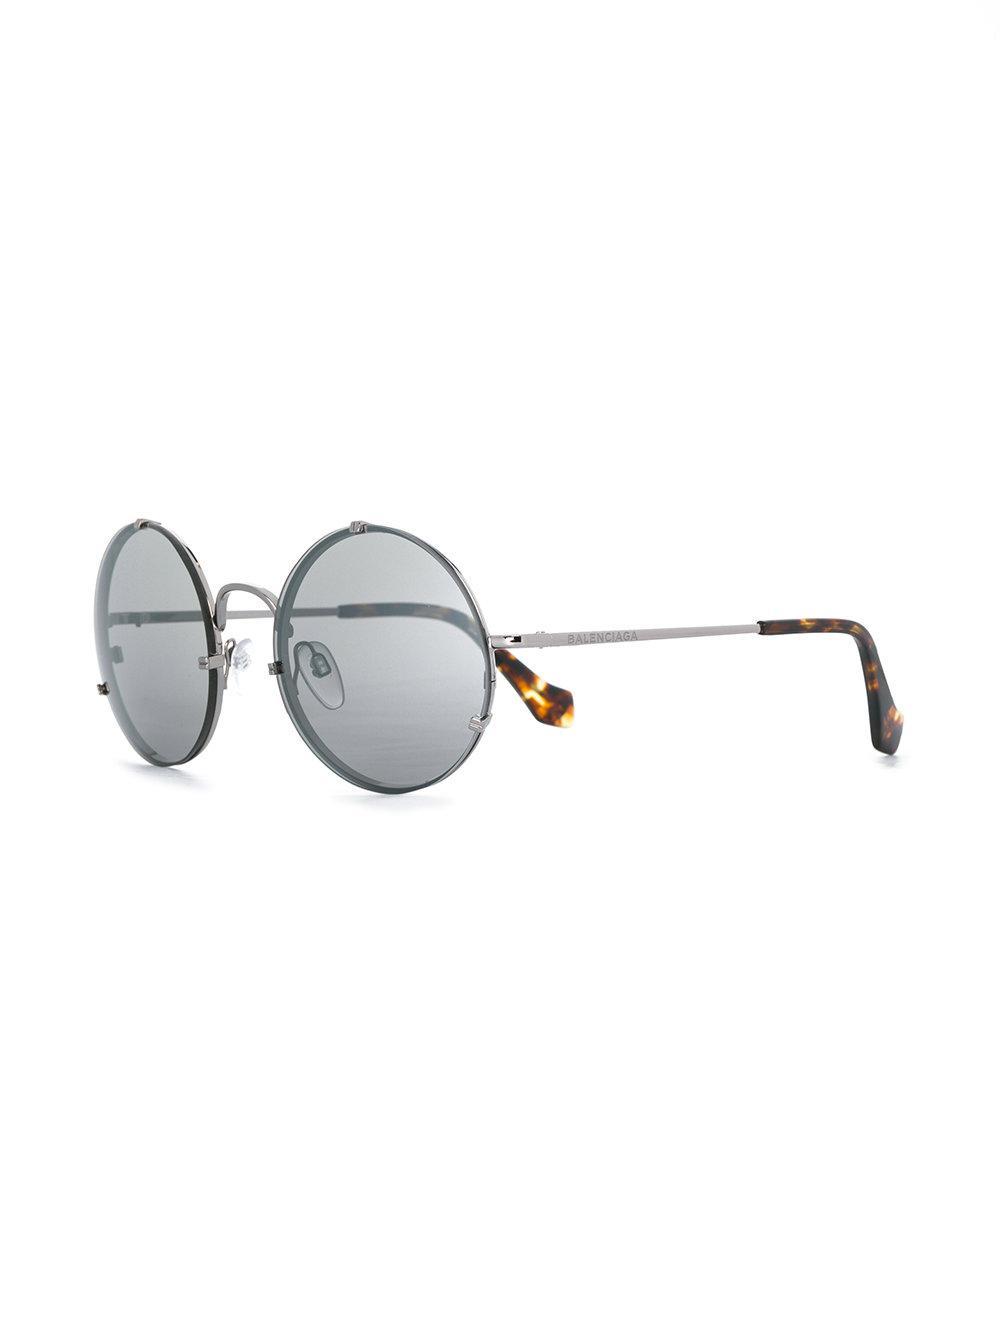 Balenciaga Rounded Sunglasses in Metallic